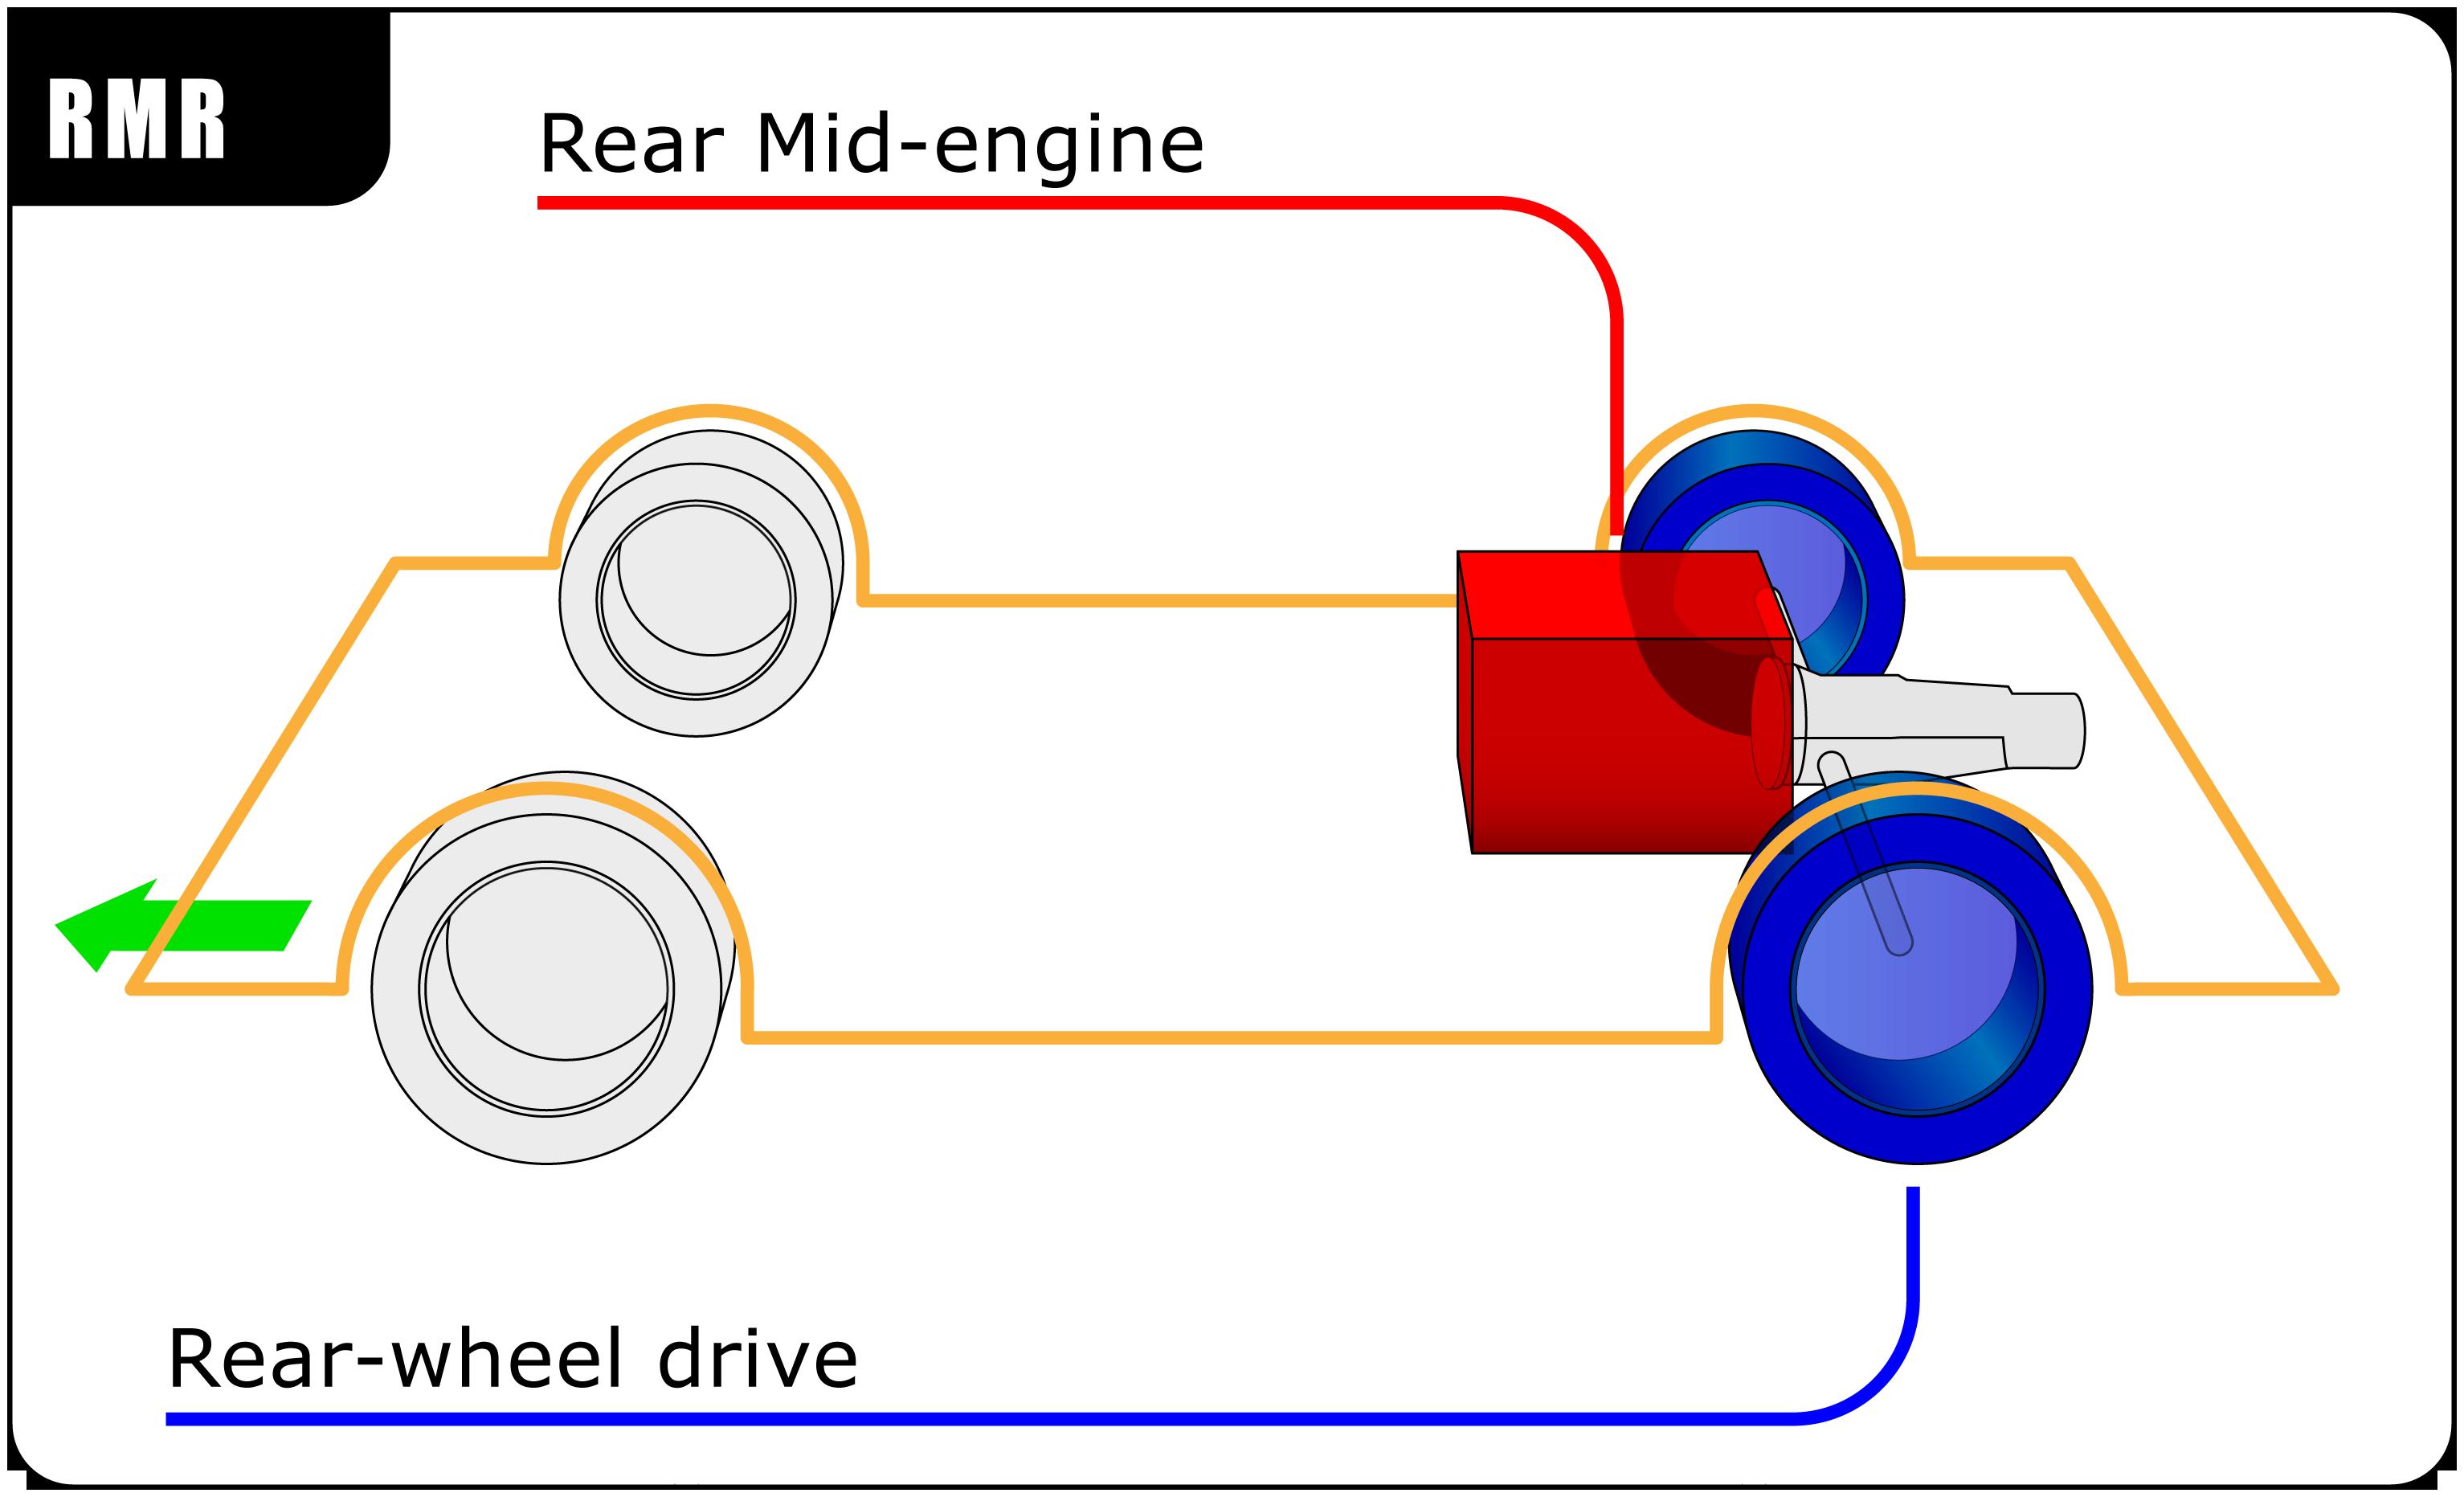 Rear mid-engine, rear-wheel drive layout